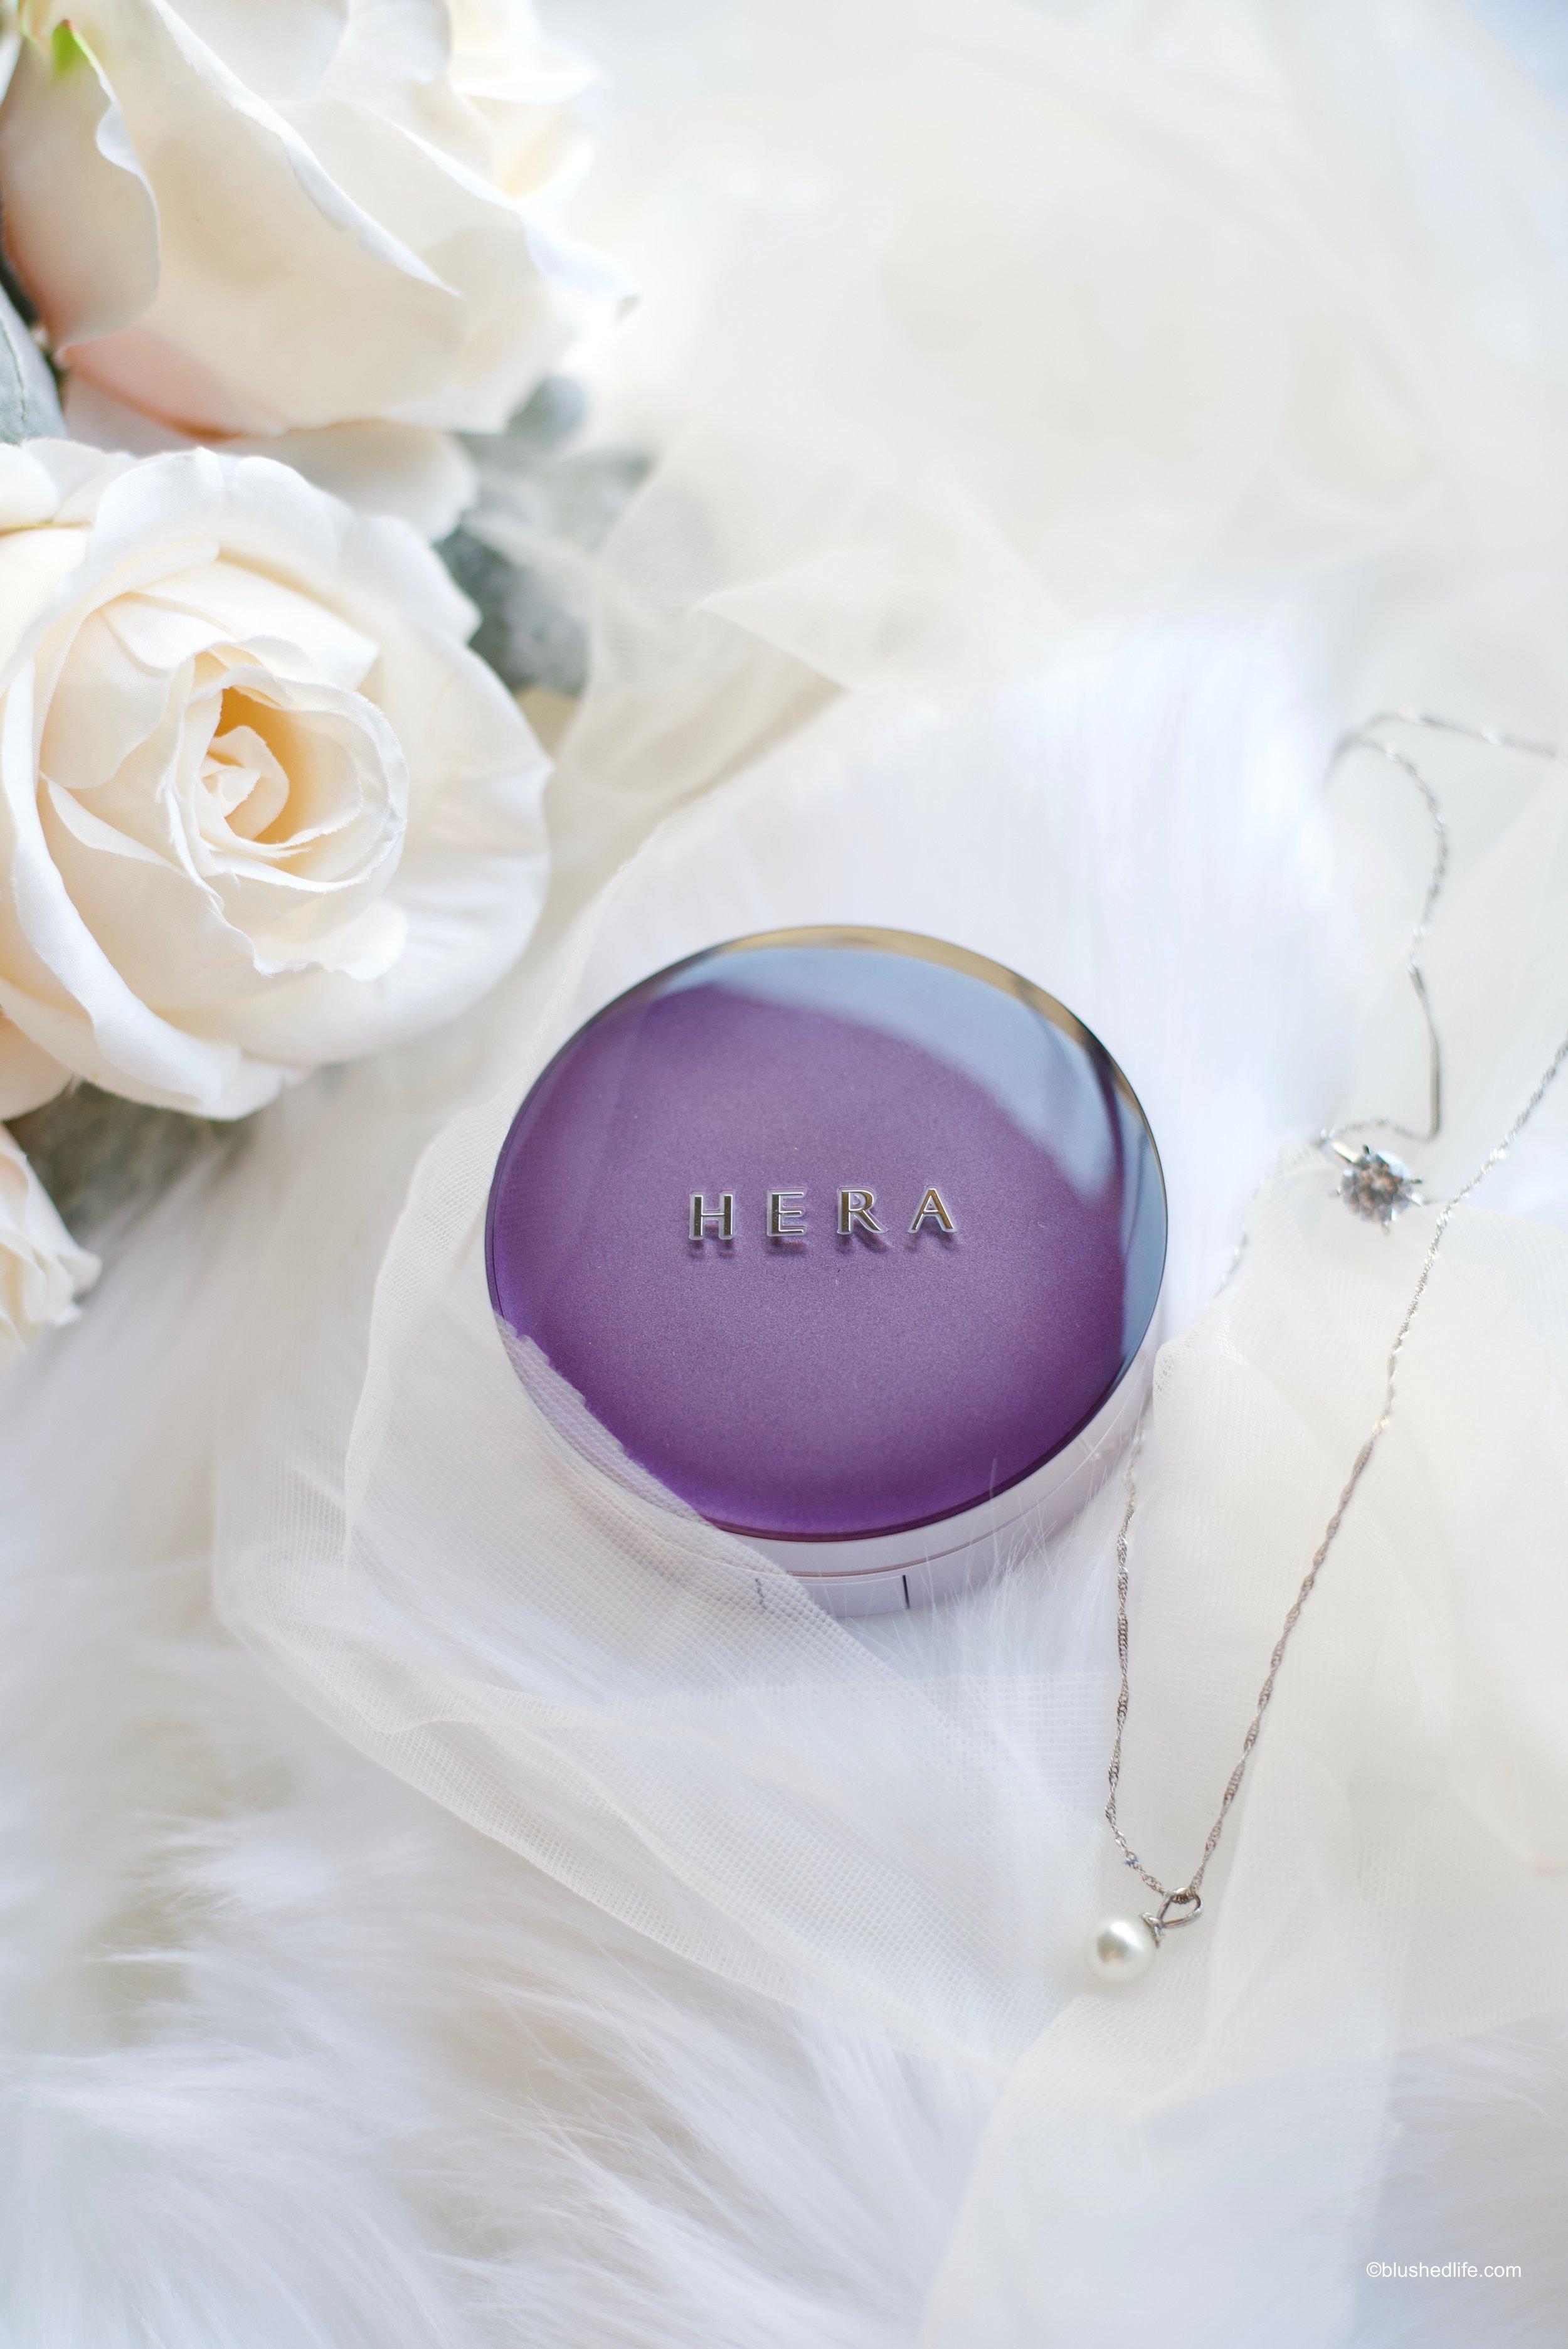 Hera UV Mist Cushion Dry Skin Acne Skin Review_DSC_3623.jpg